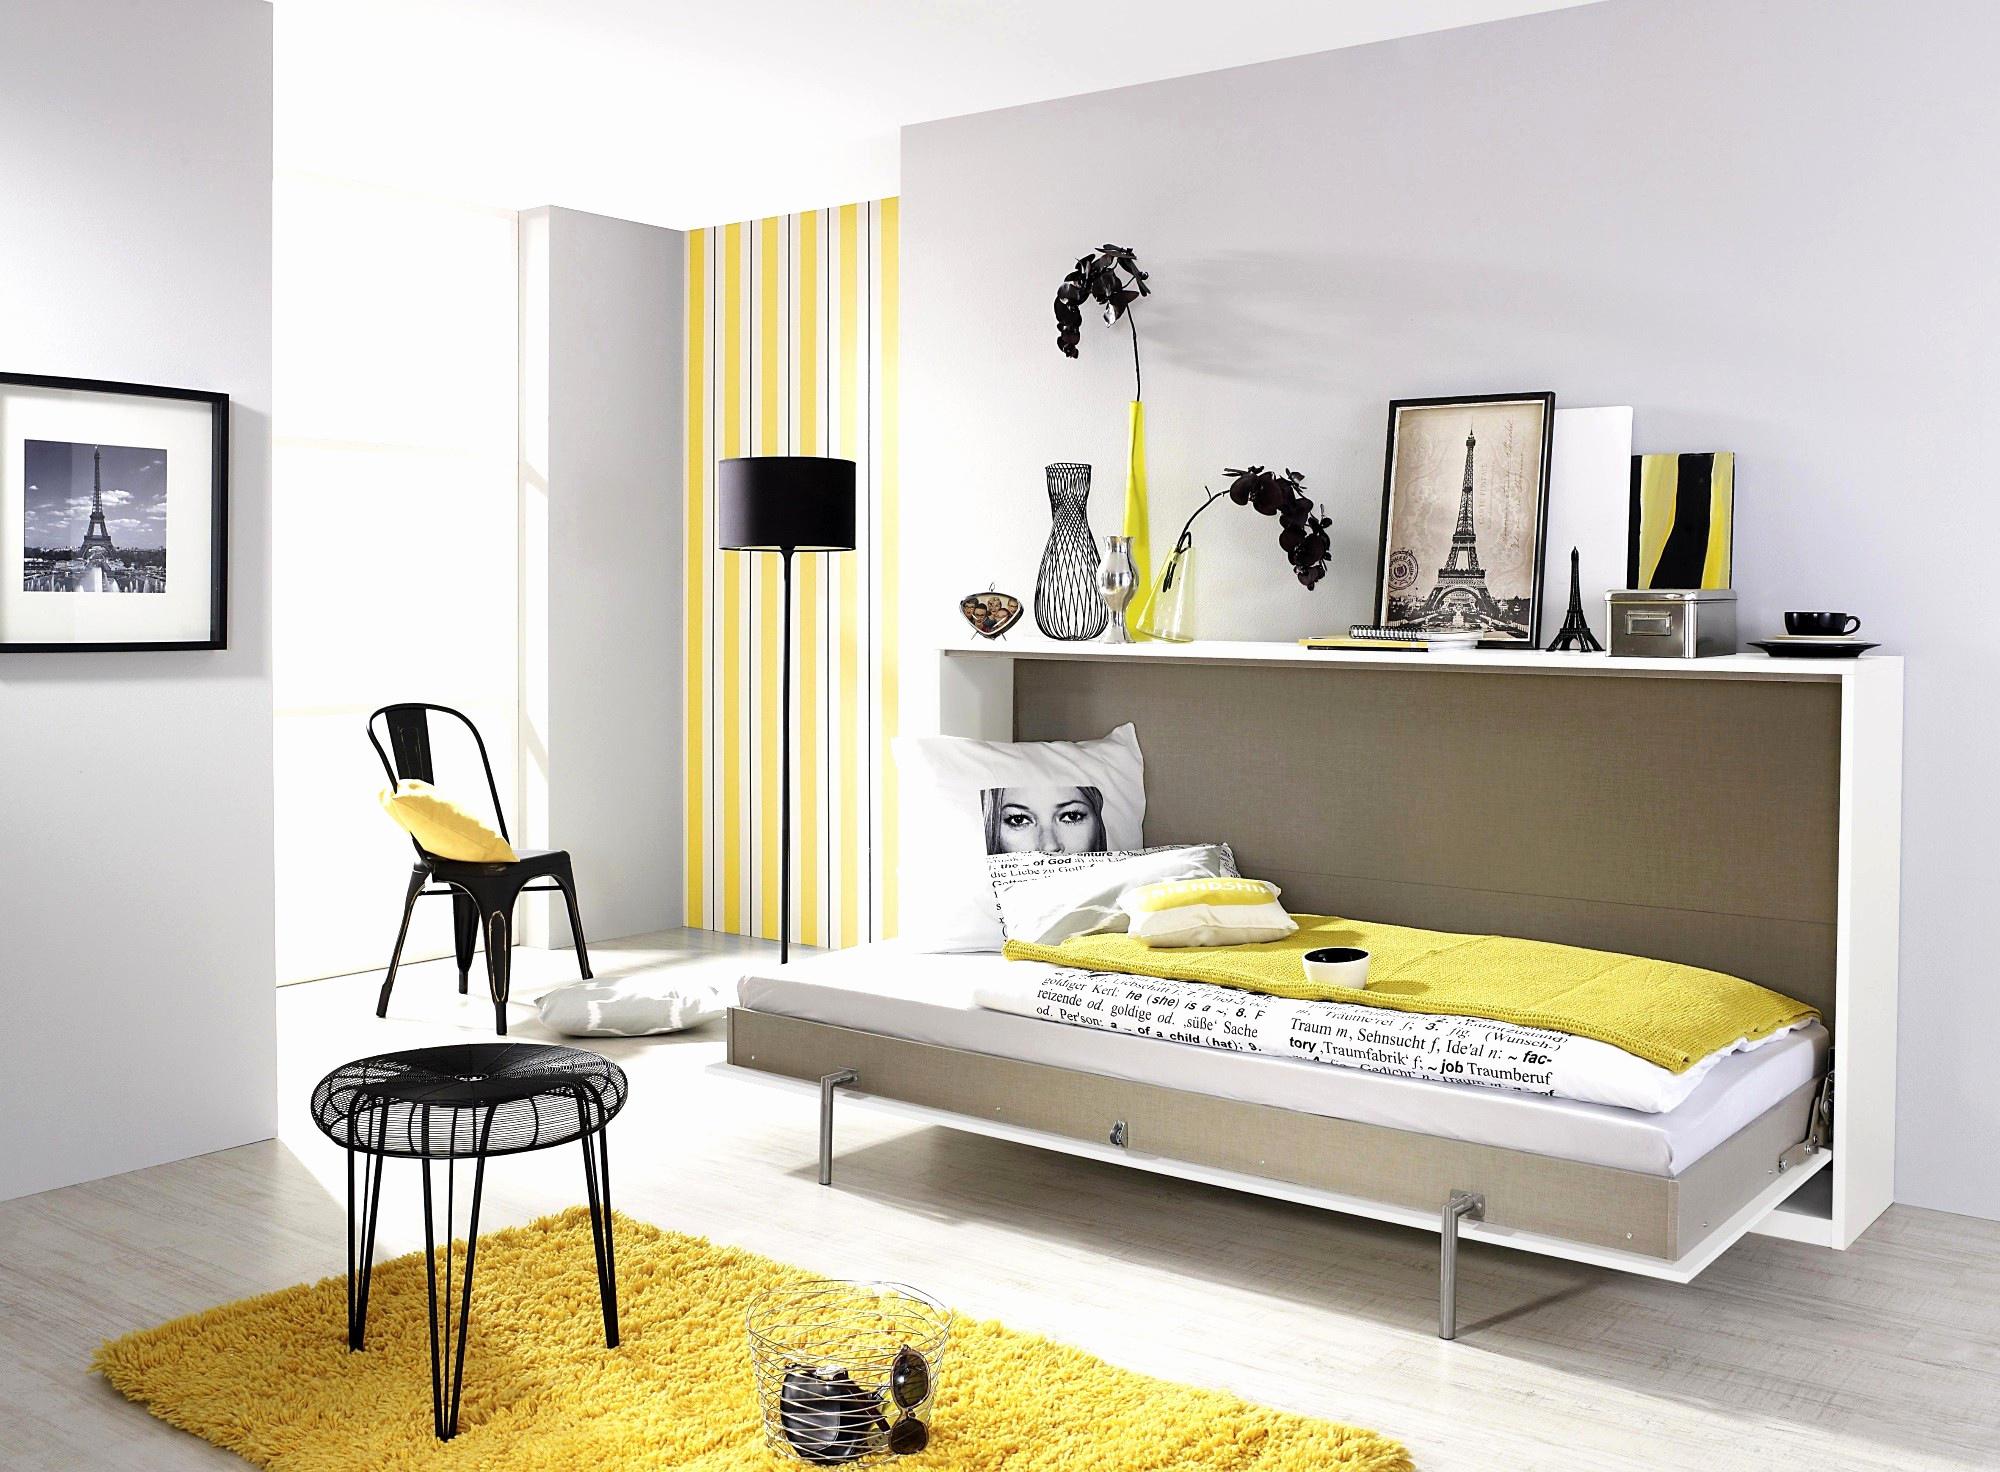 protege matelas leclerc elegant leclerc meubles nantes protege matelas leclerc elegant matelas bain of protege matelas leclerc